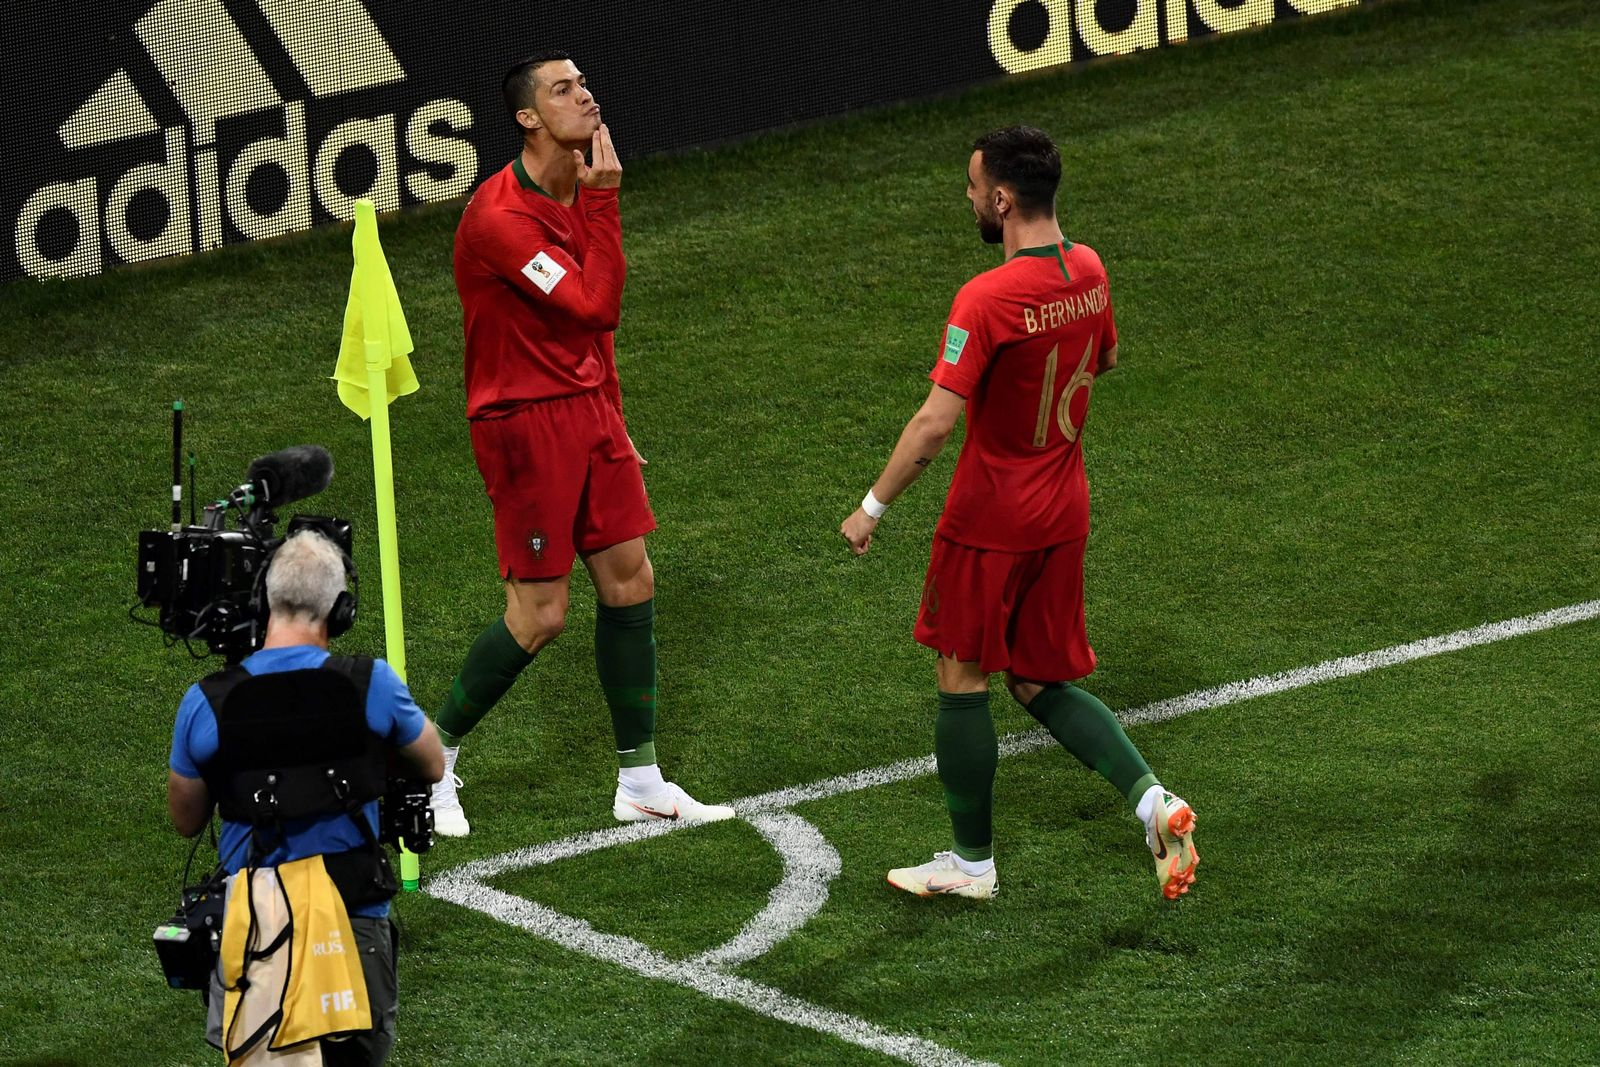 Cristiano Ronaldo/Goat